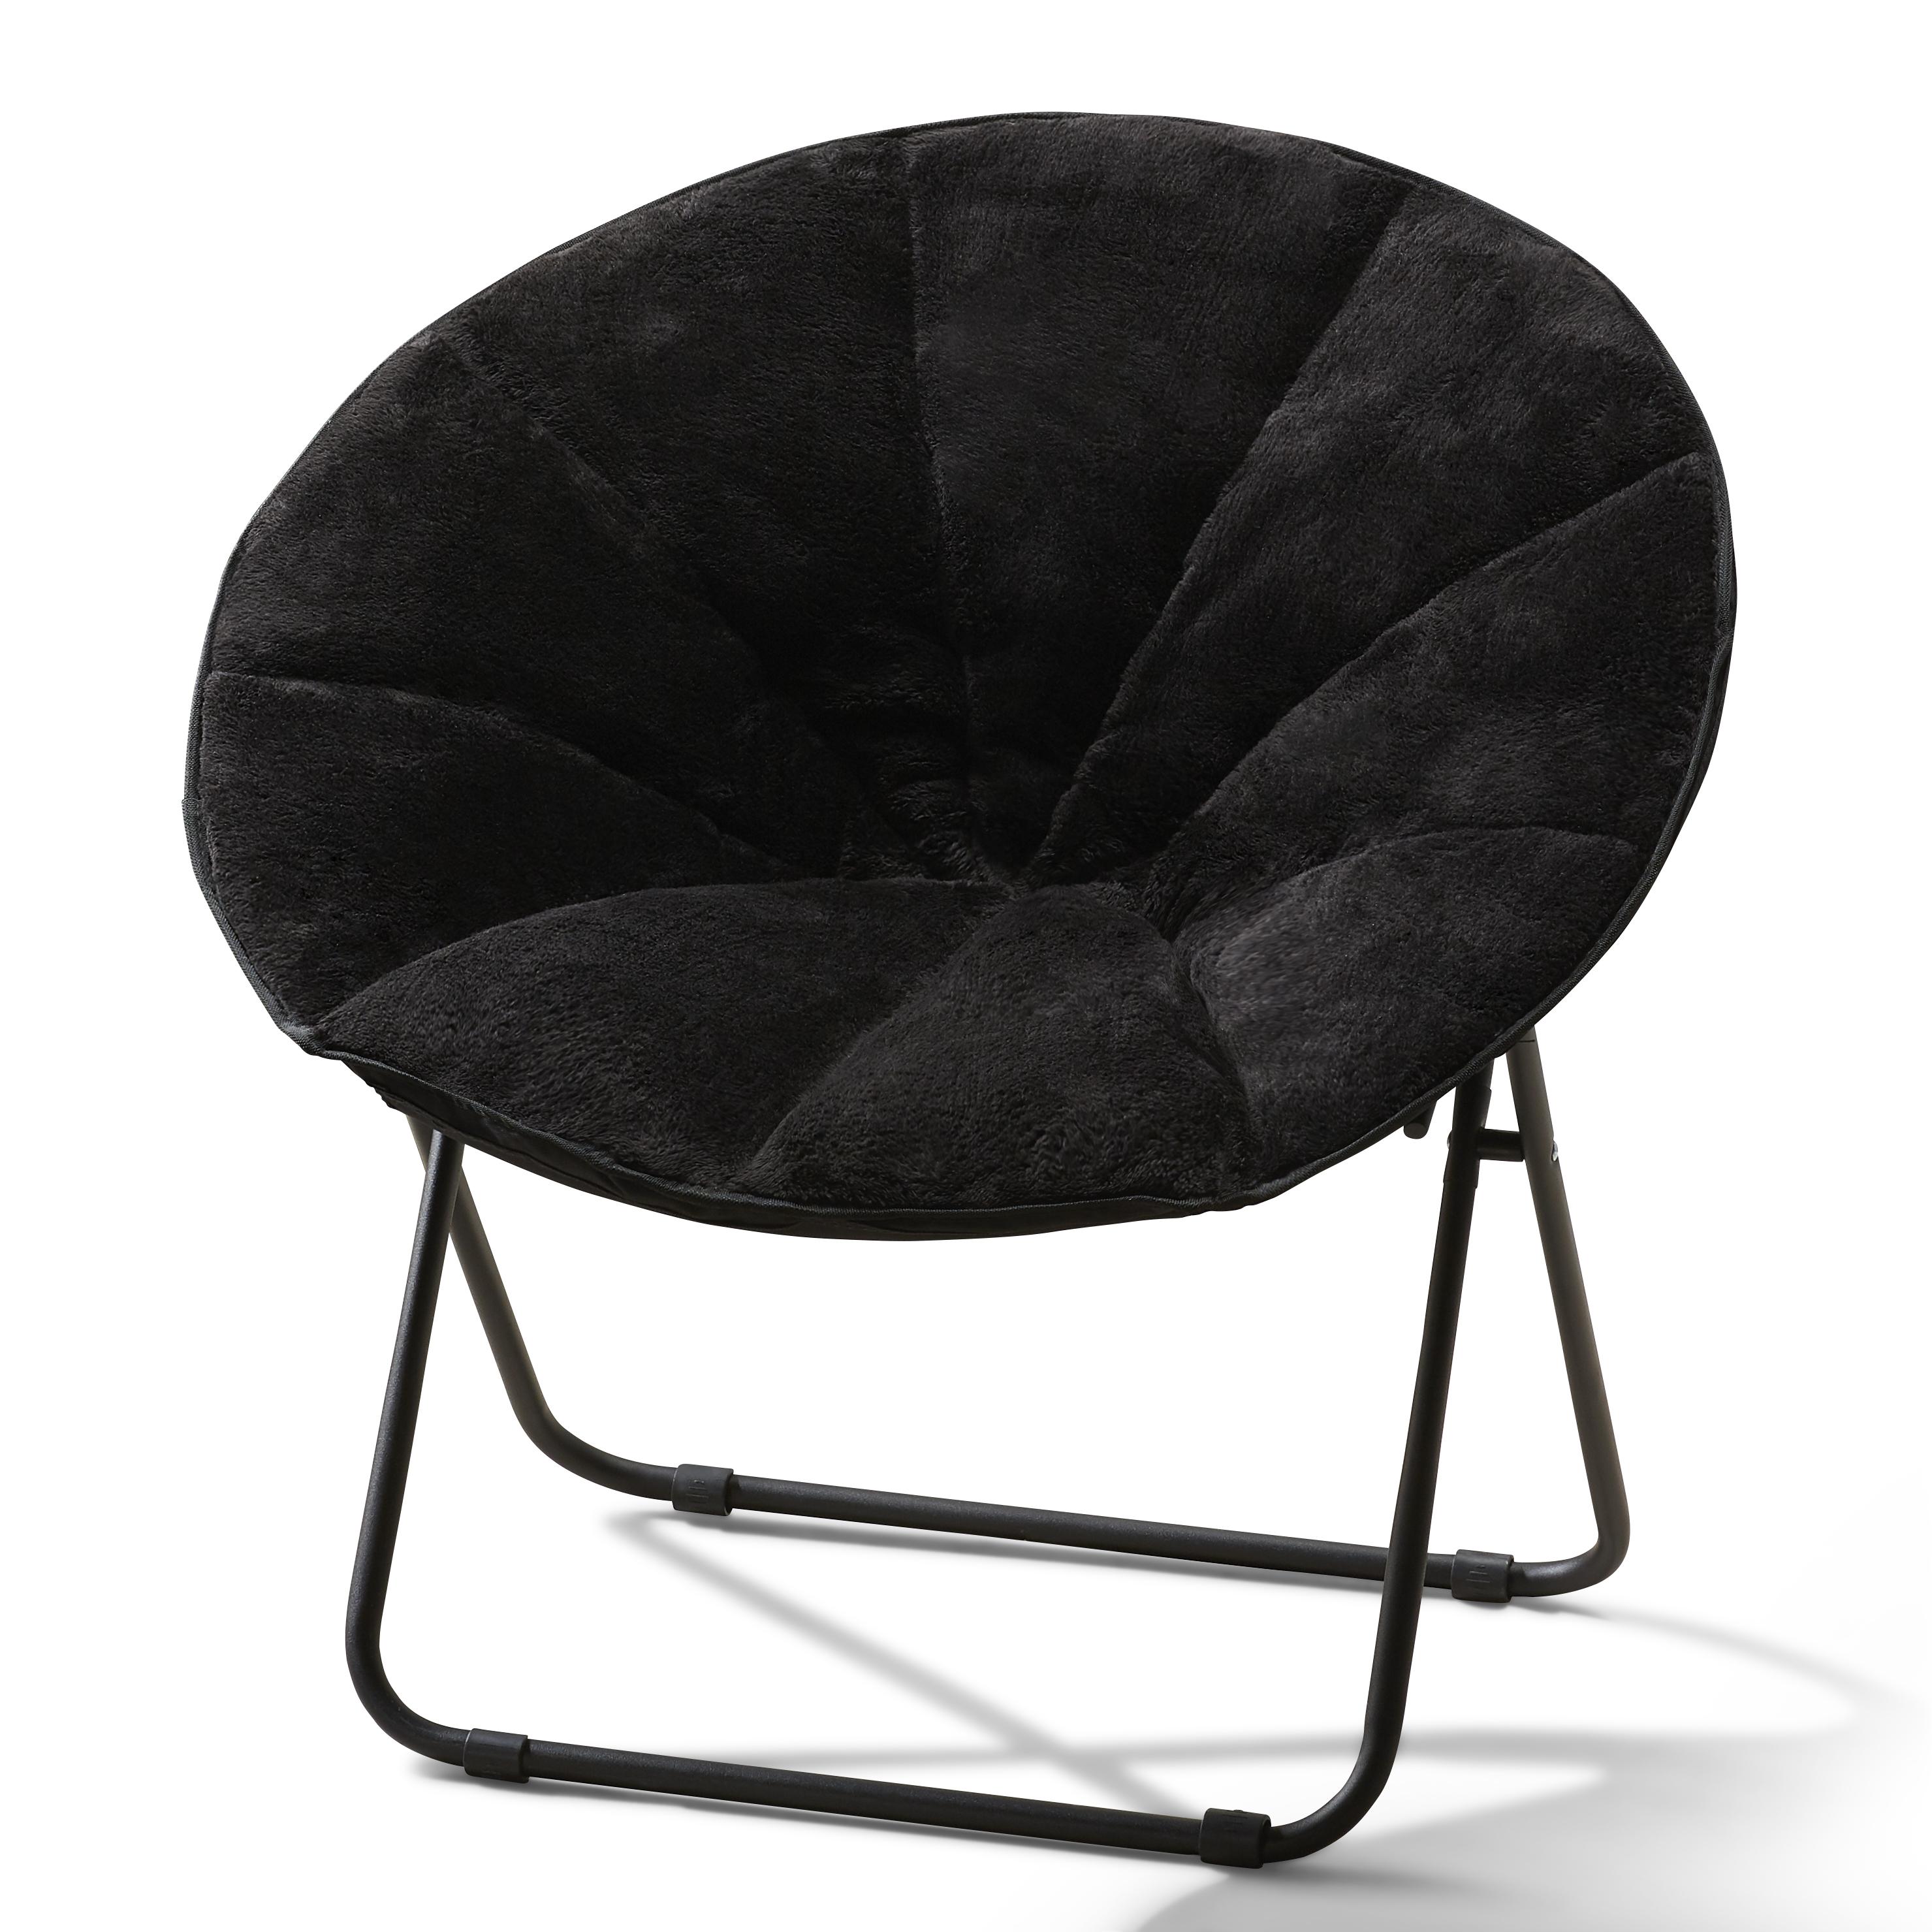 saucer chairs sam s club eames chair frasier mainstays folding plush multiple colors walmart com